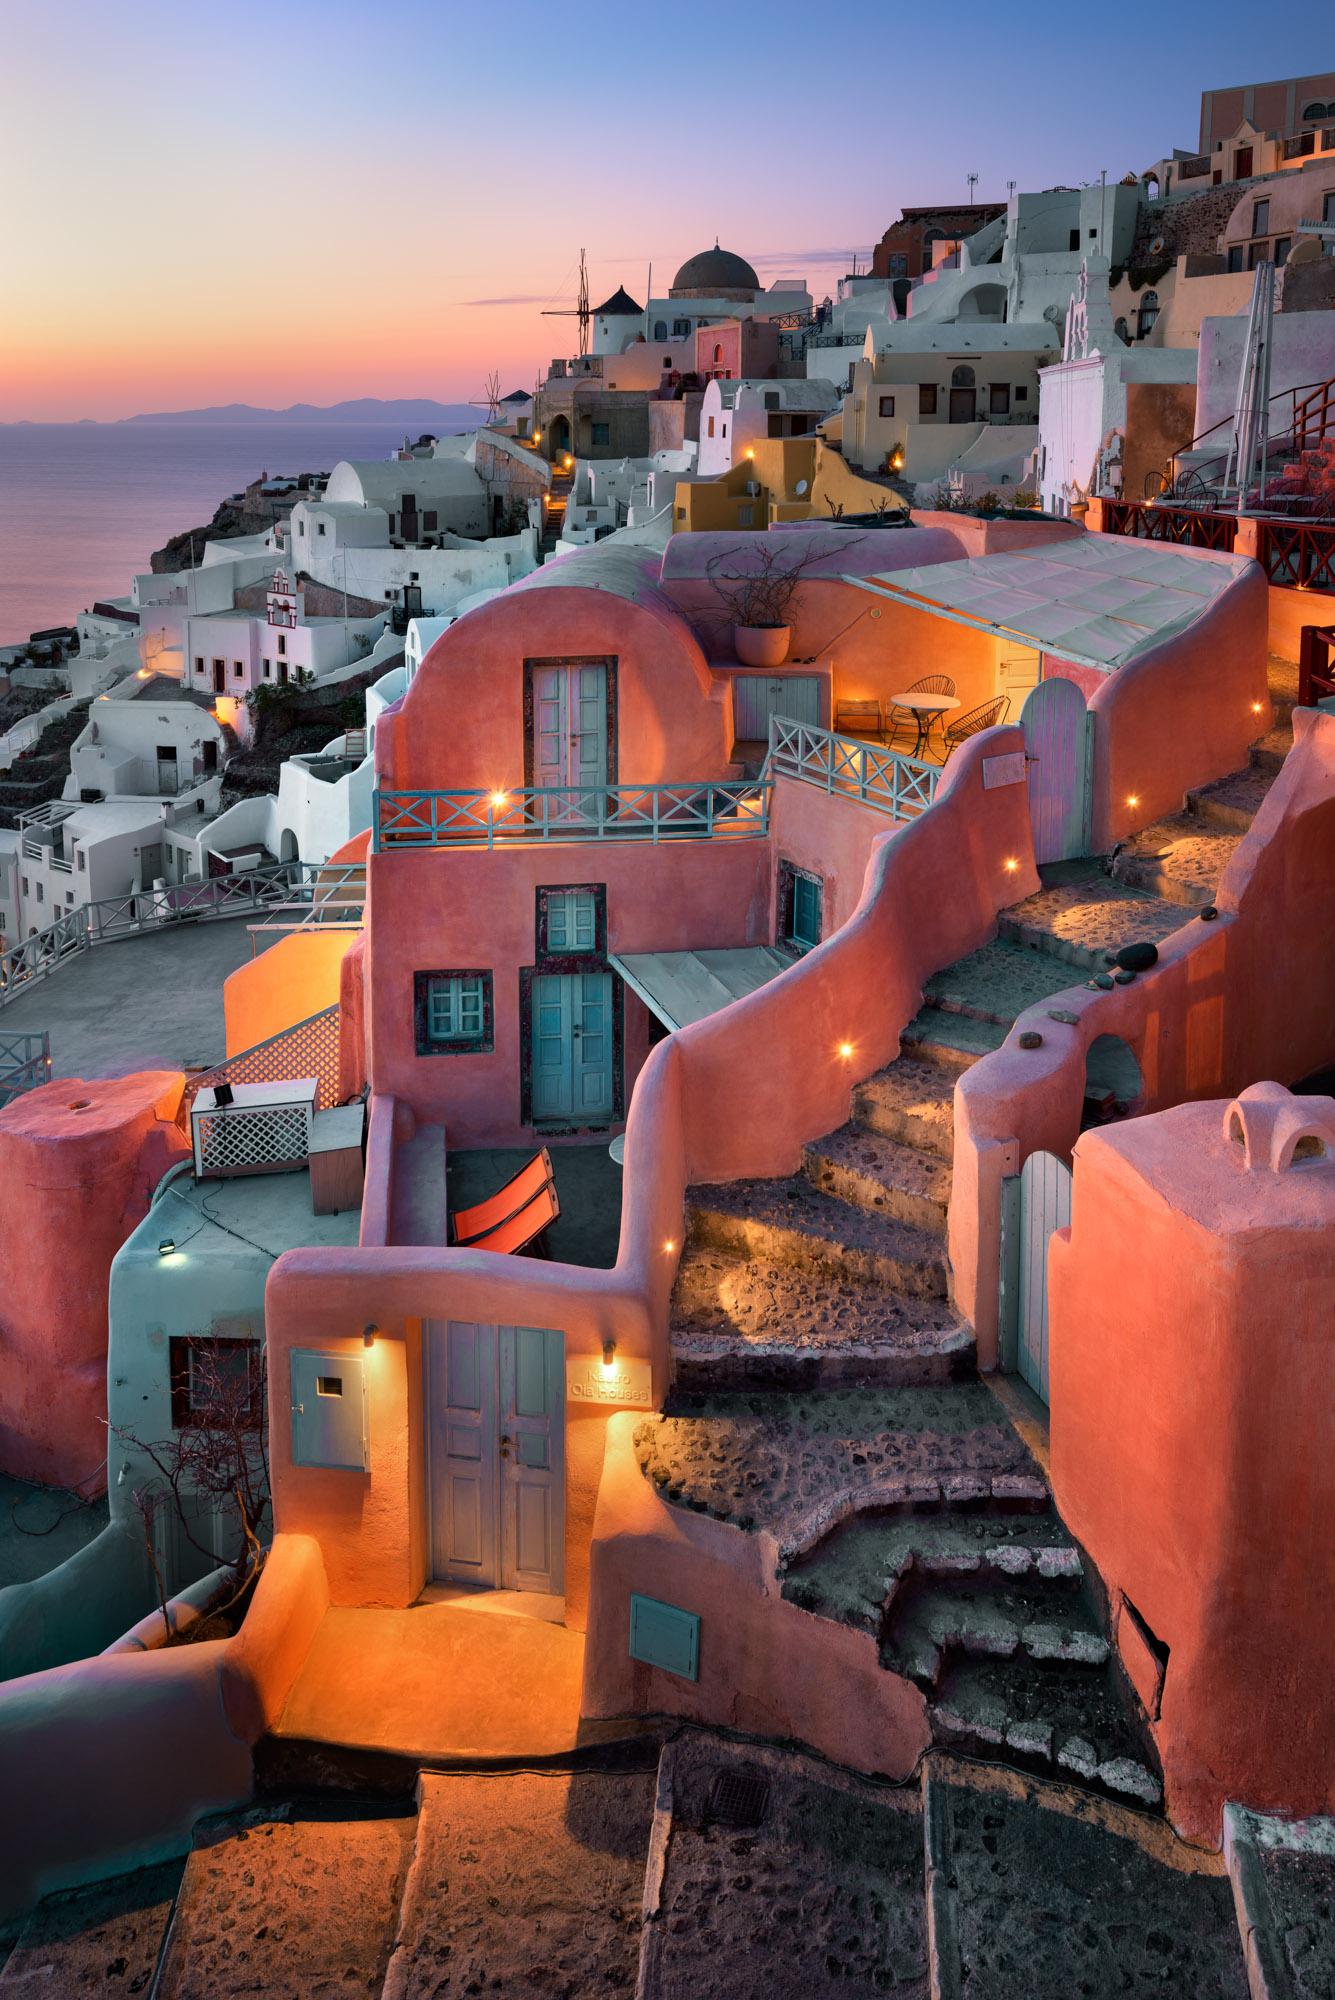 Stairs and Houses of Oia, Santorini, Greece